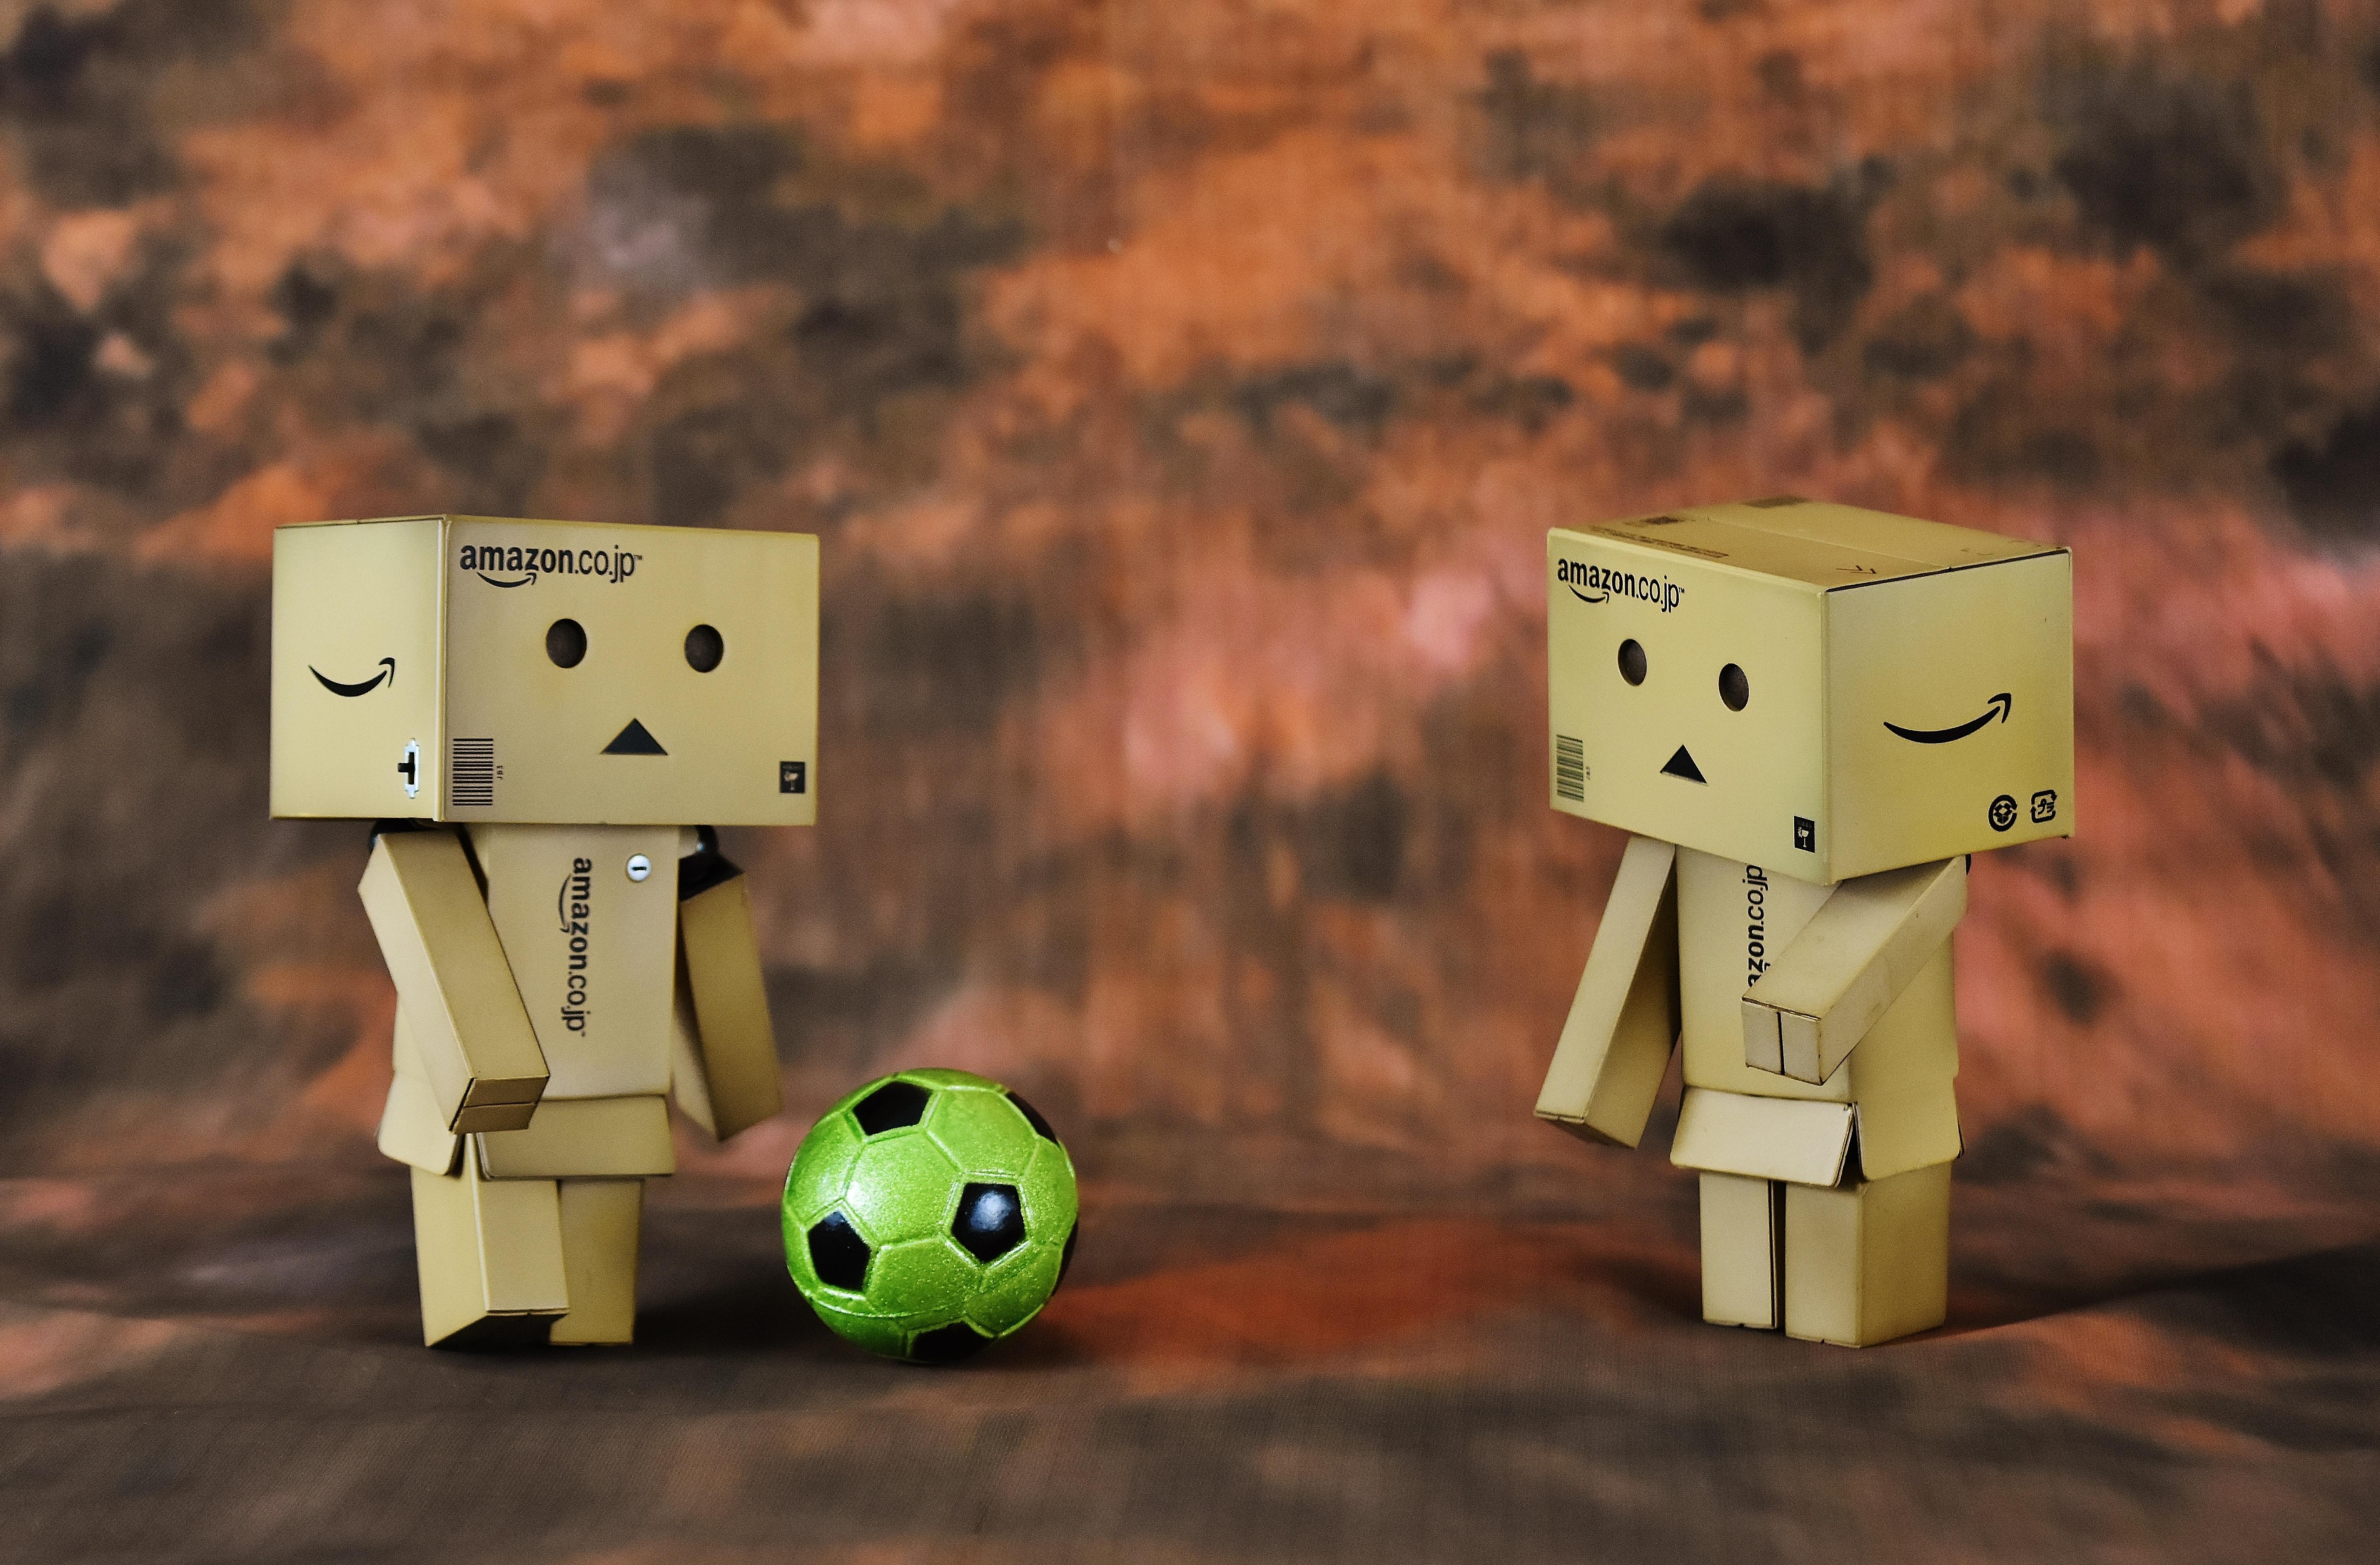 Gambar Bermain Jumlah Imut Rekreasi Hijau Kuning Sepak Bola